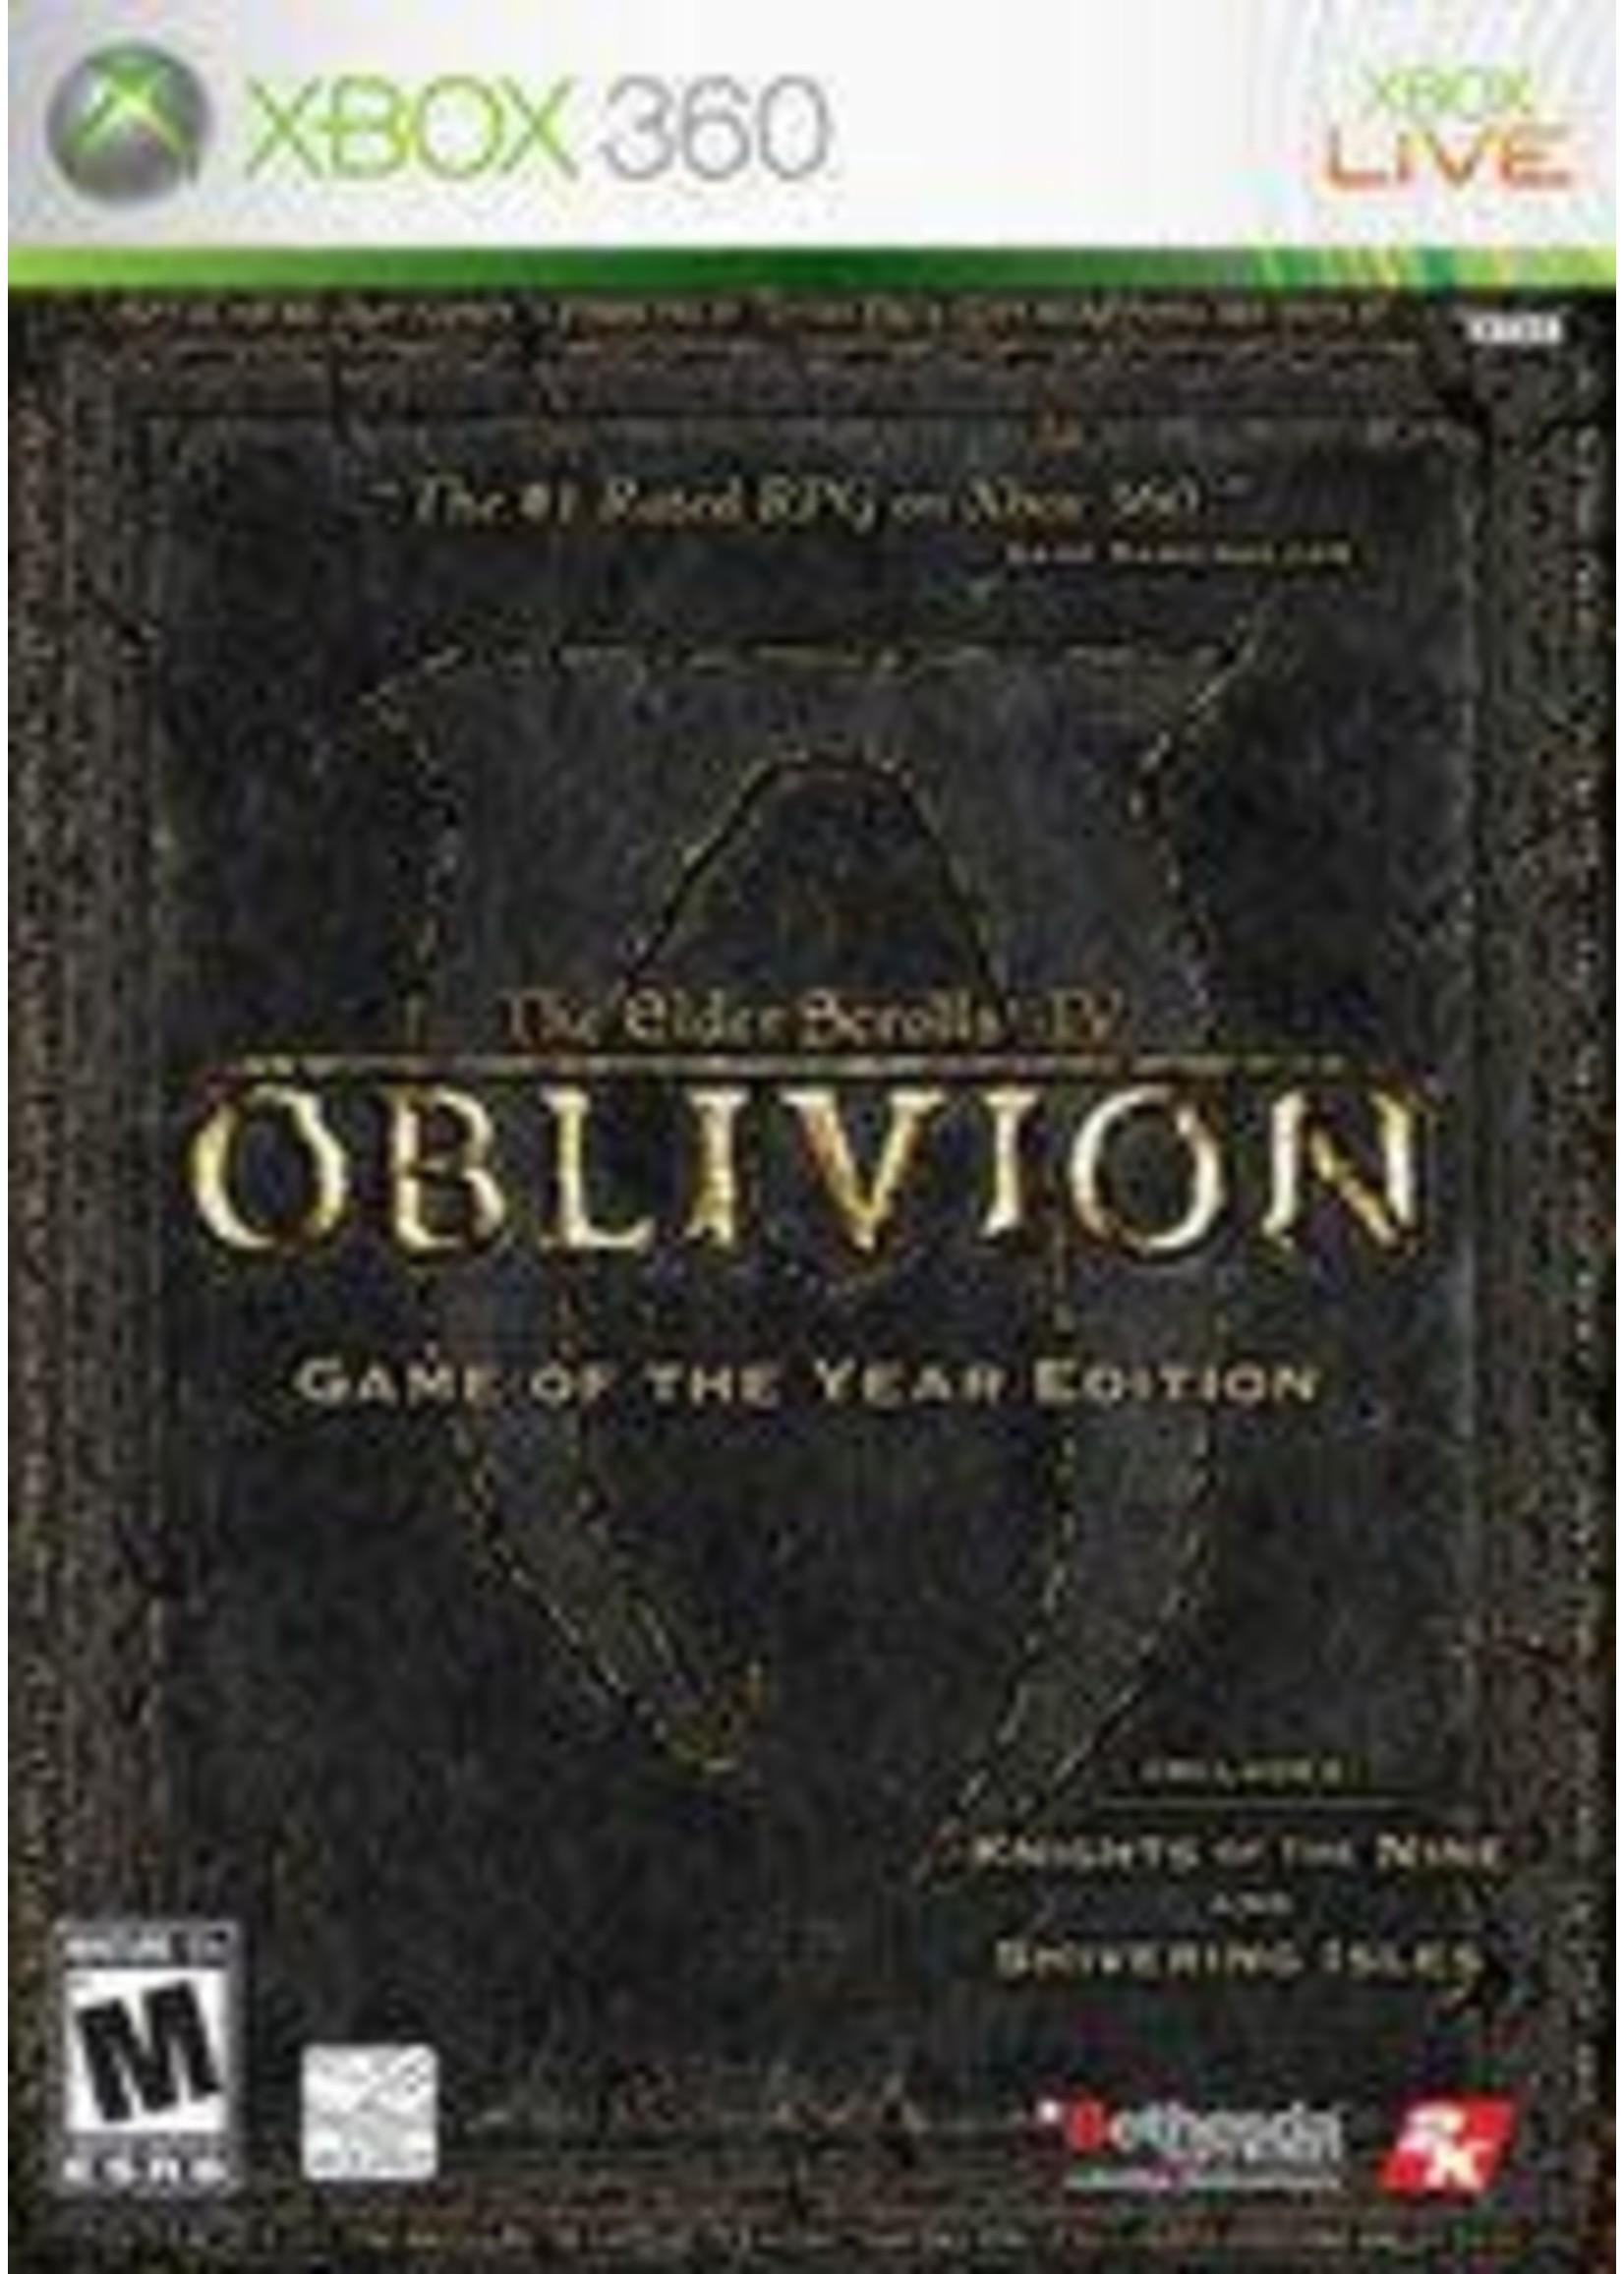 Elder Scrolls IV Oblivion [Game Of The Year] Xbox 360